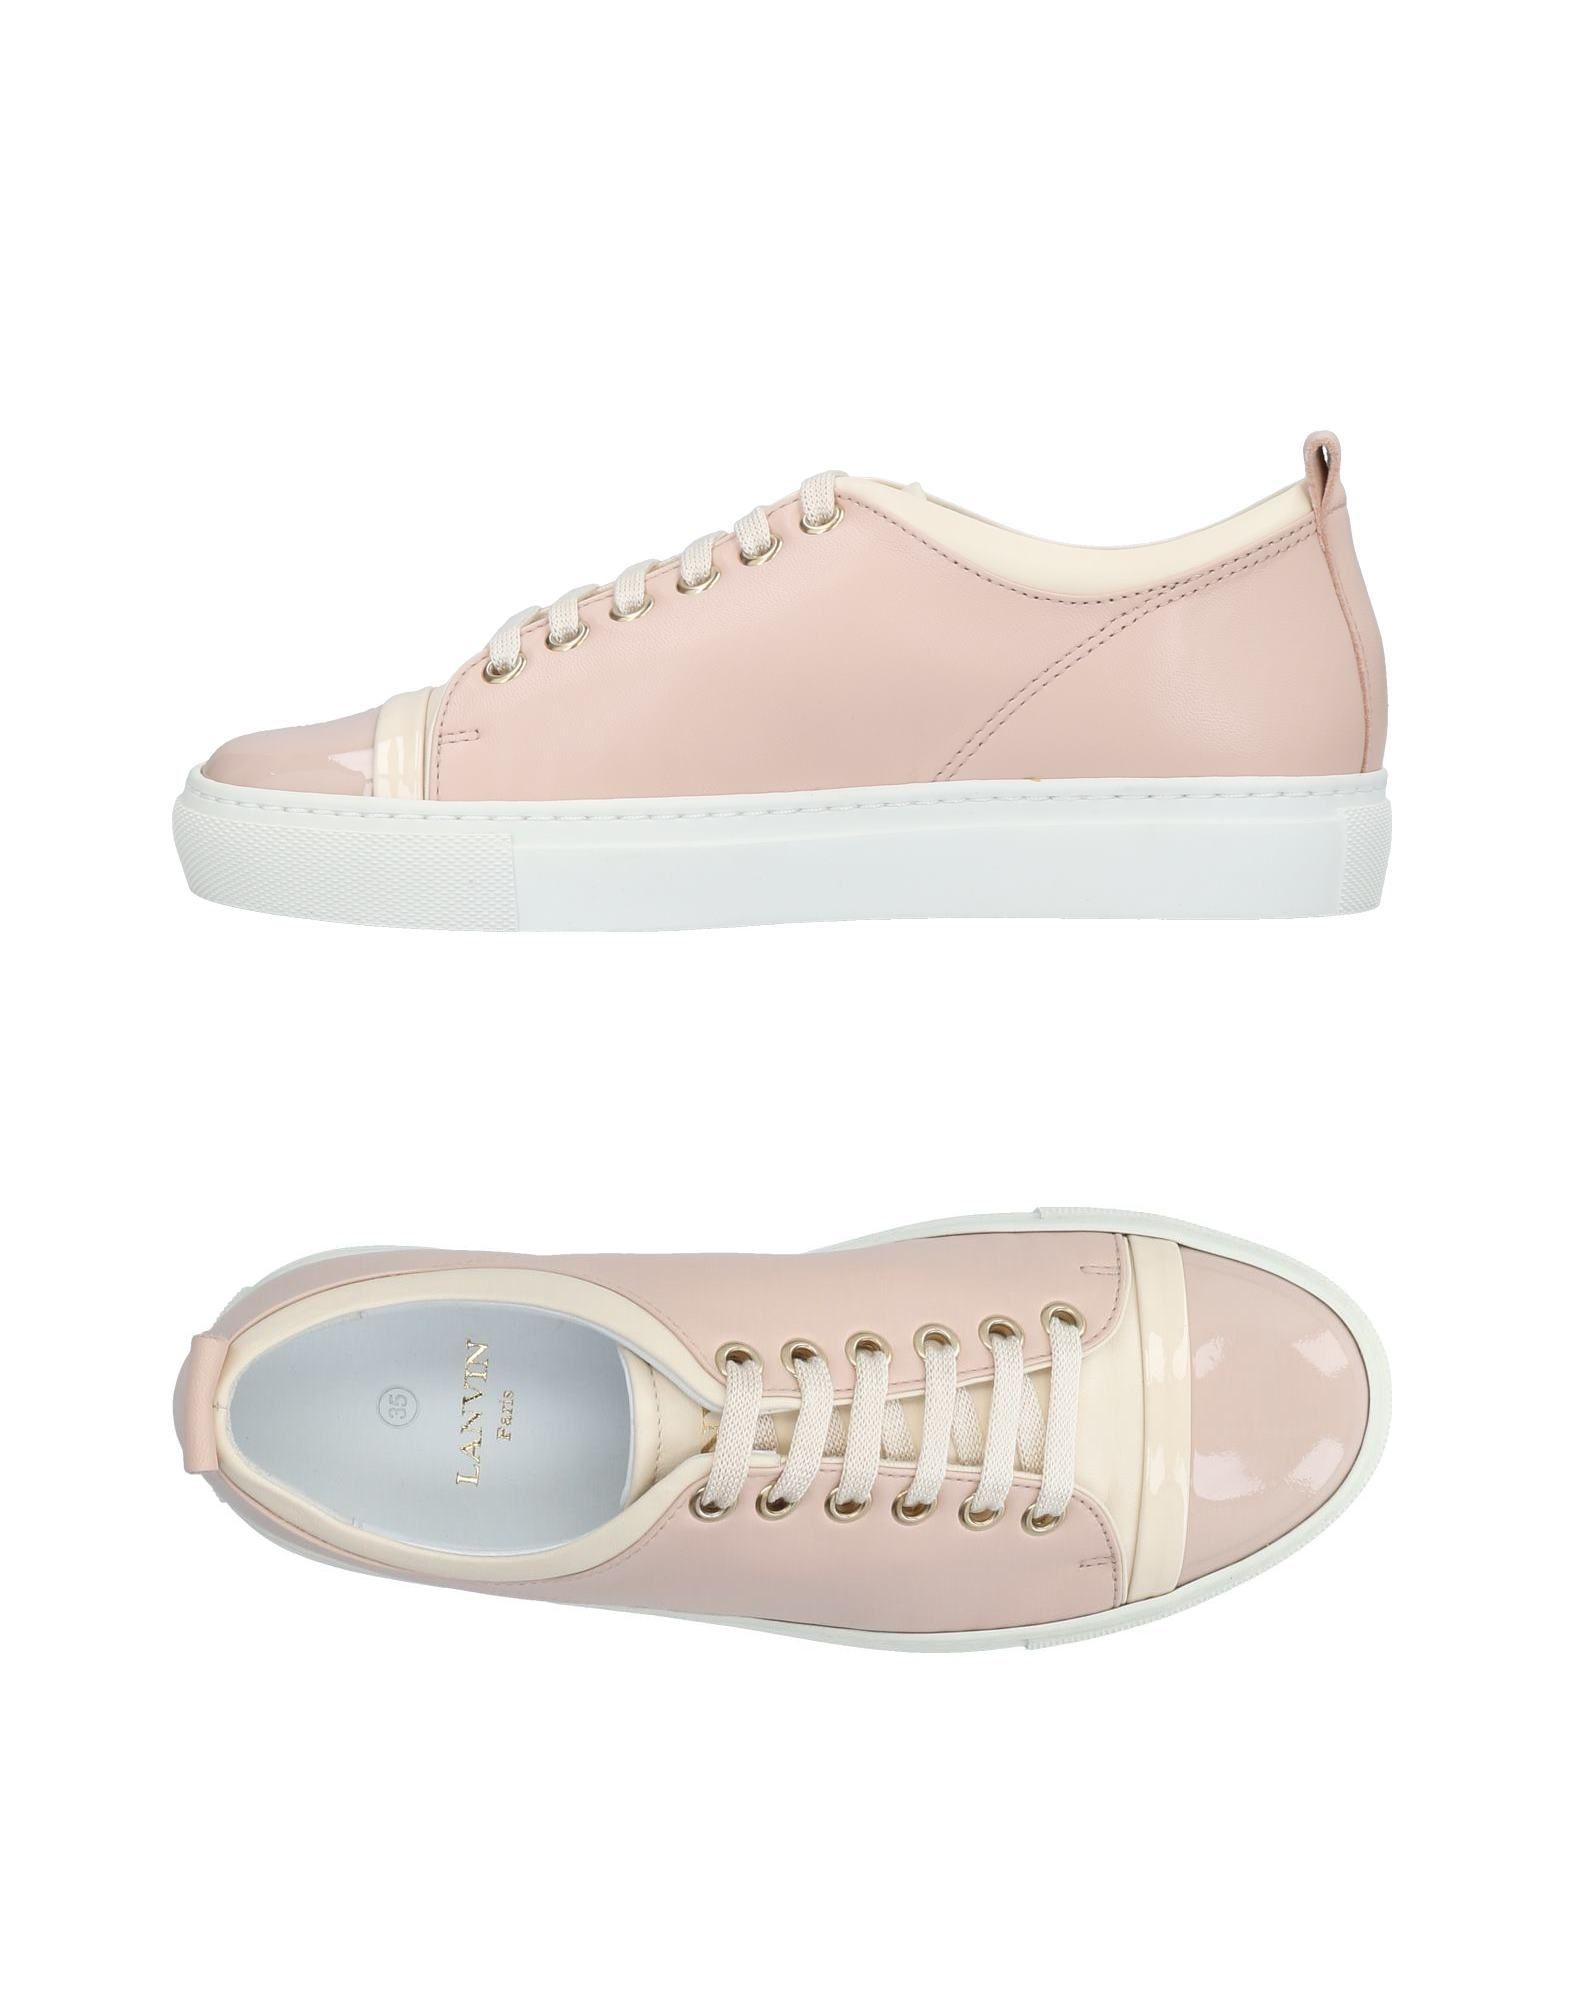 11491595GJ Lanvin Sneakers Damen  11491595GJ  Heiße Schuhe e934bf